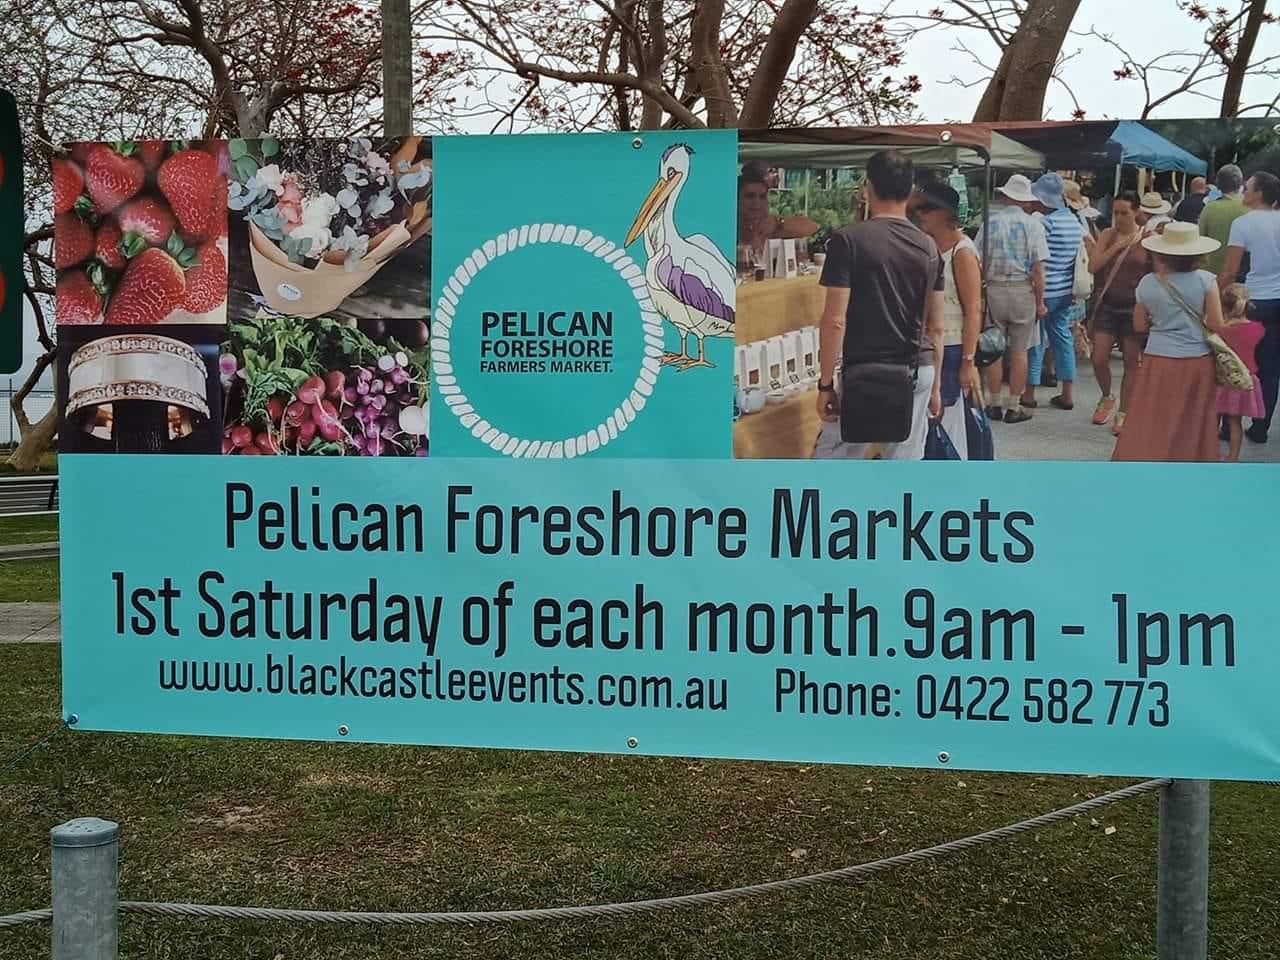 Pelican foreshore market